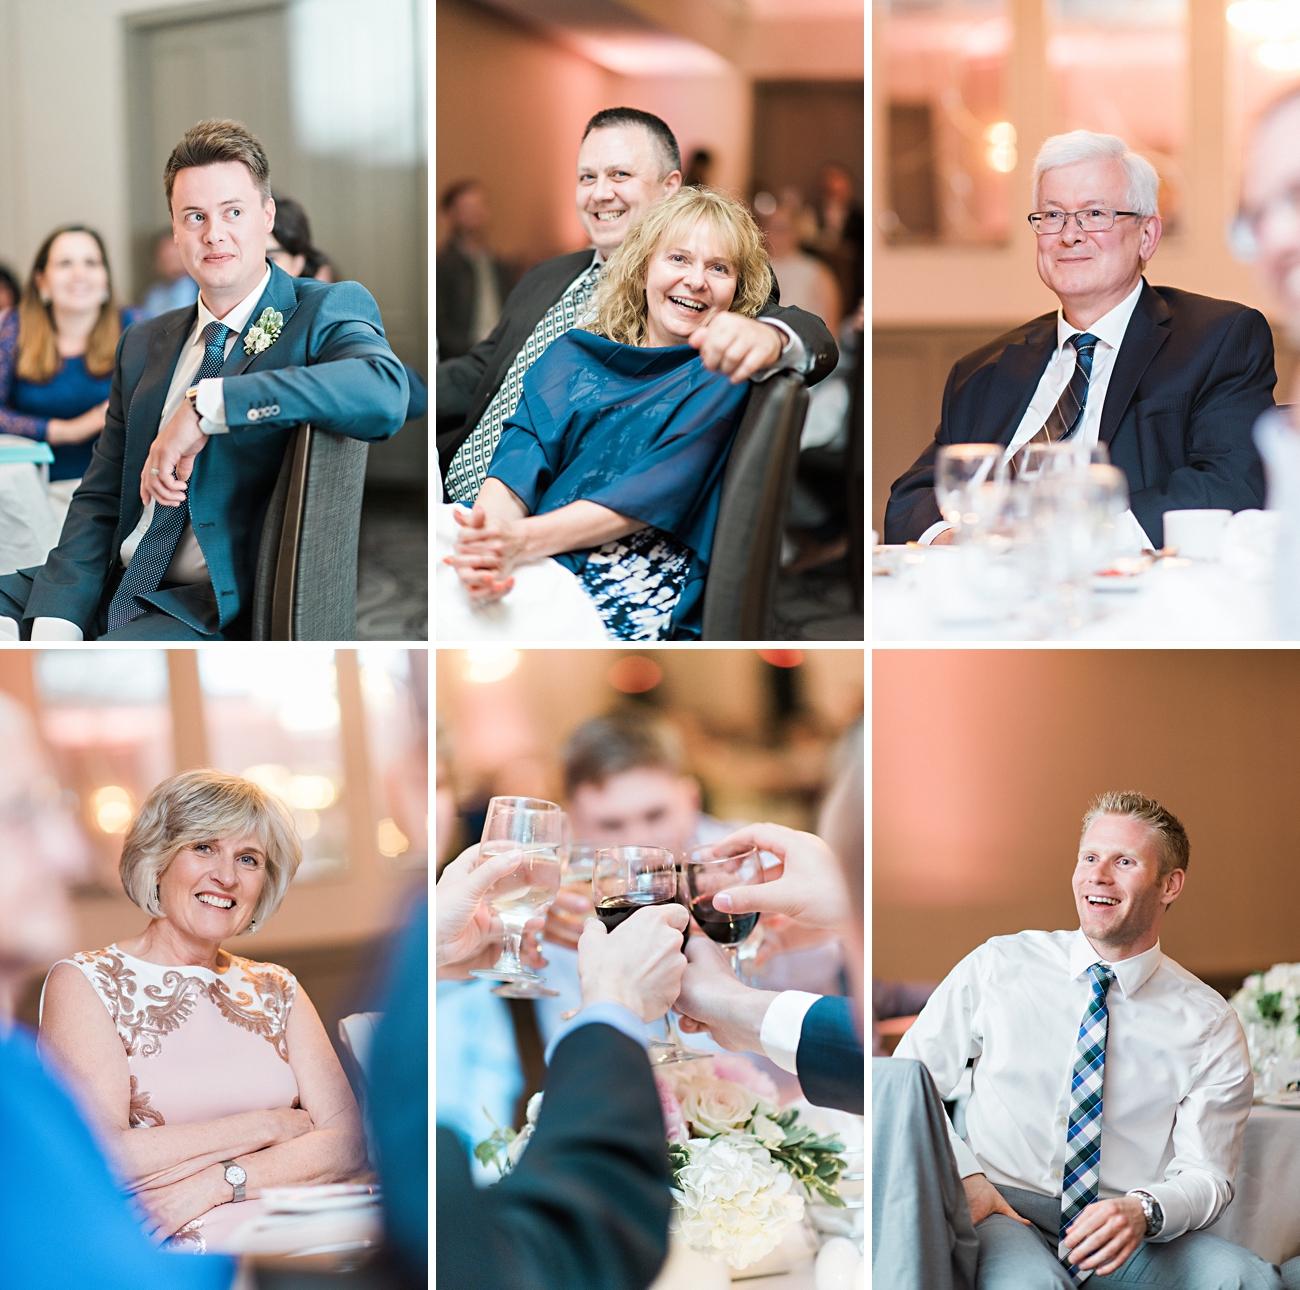 Sara-Seans-Halifax-Prince-George-Hotel-Wedding076.jpg